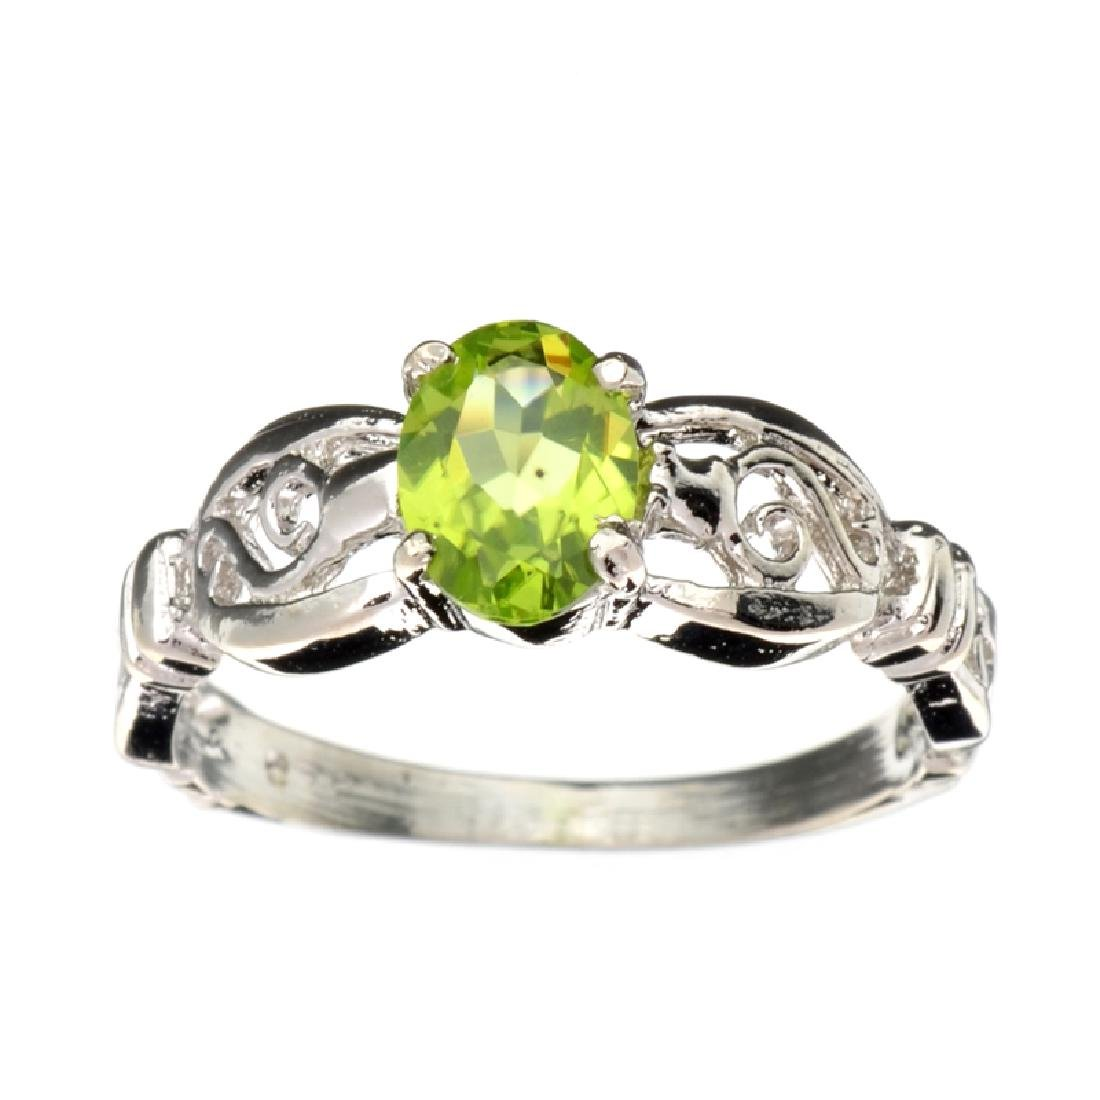 APP: 0.7k Fine Jewelry 0.85CT Oval Cut Green Peridot